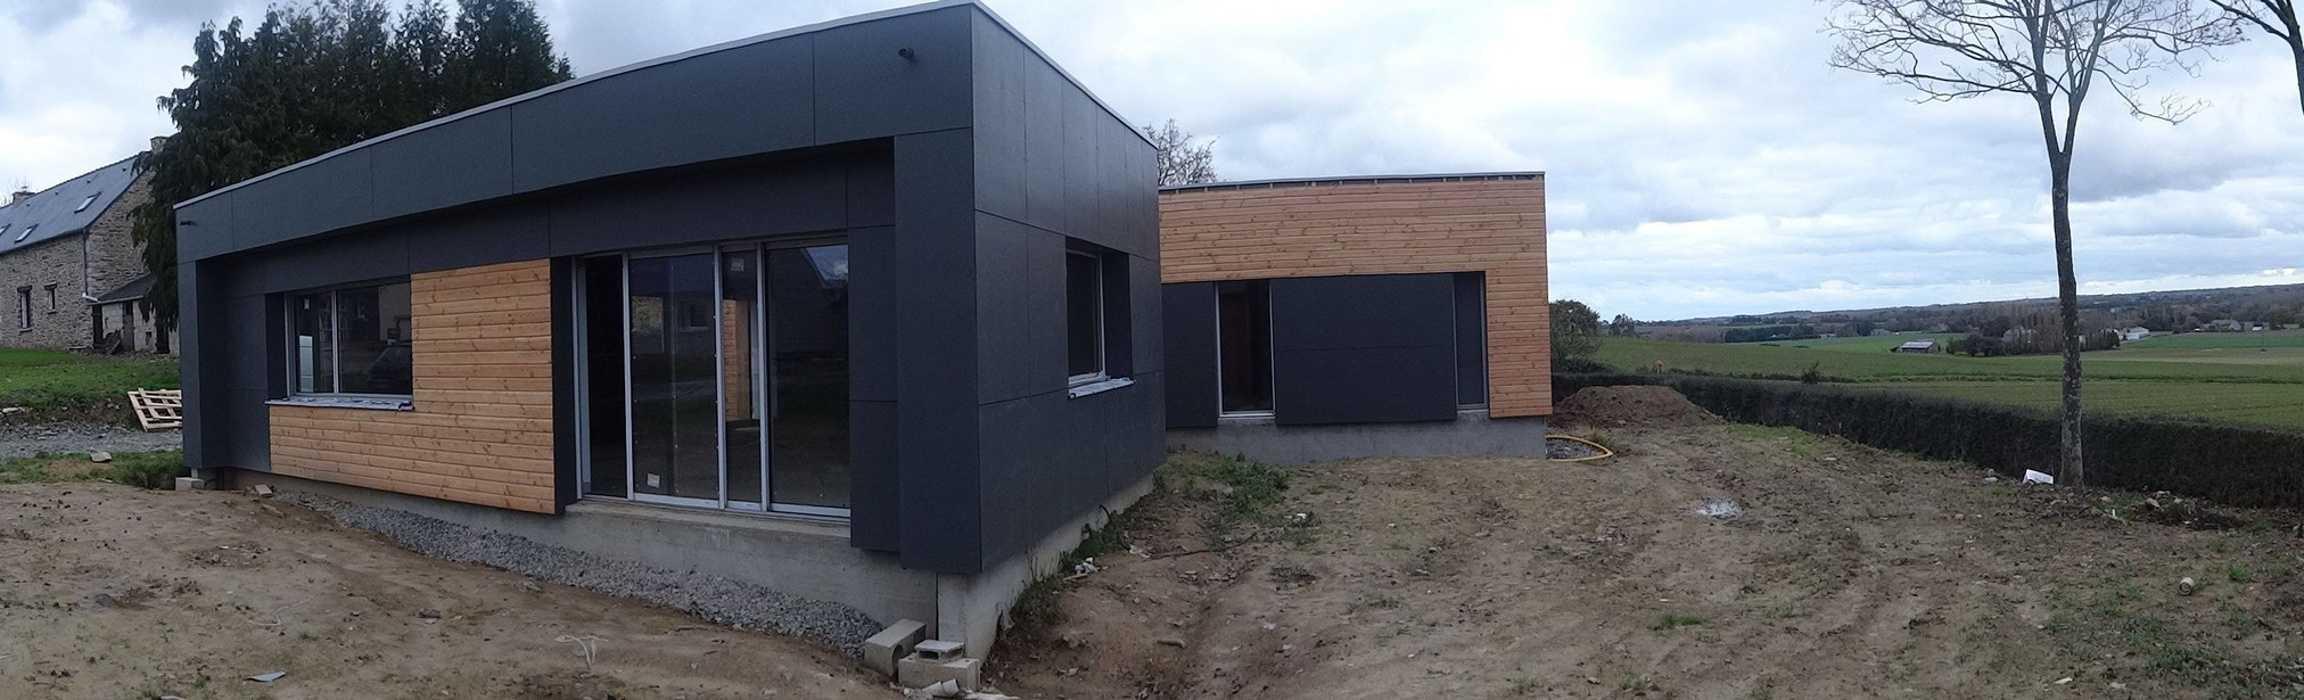 Maison ossature bois toit plat - Hénanbihen 0